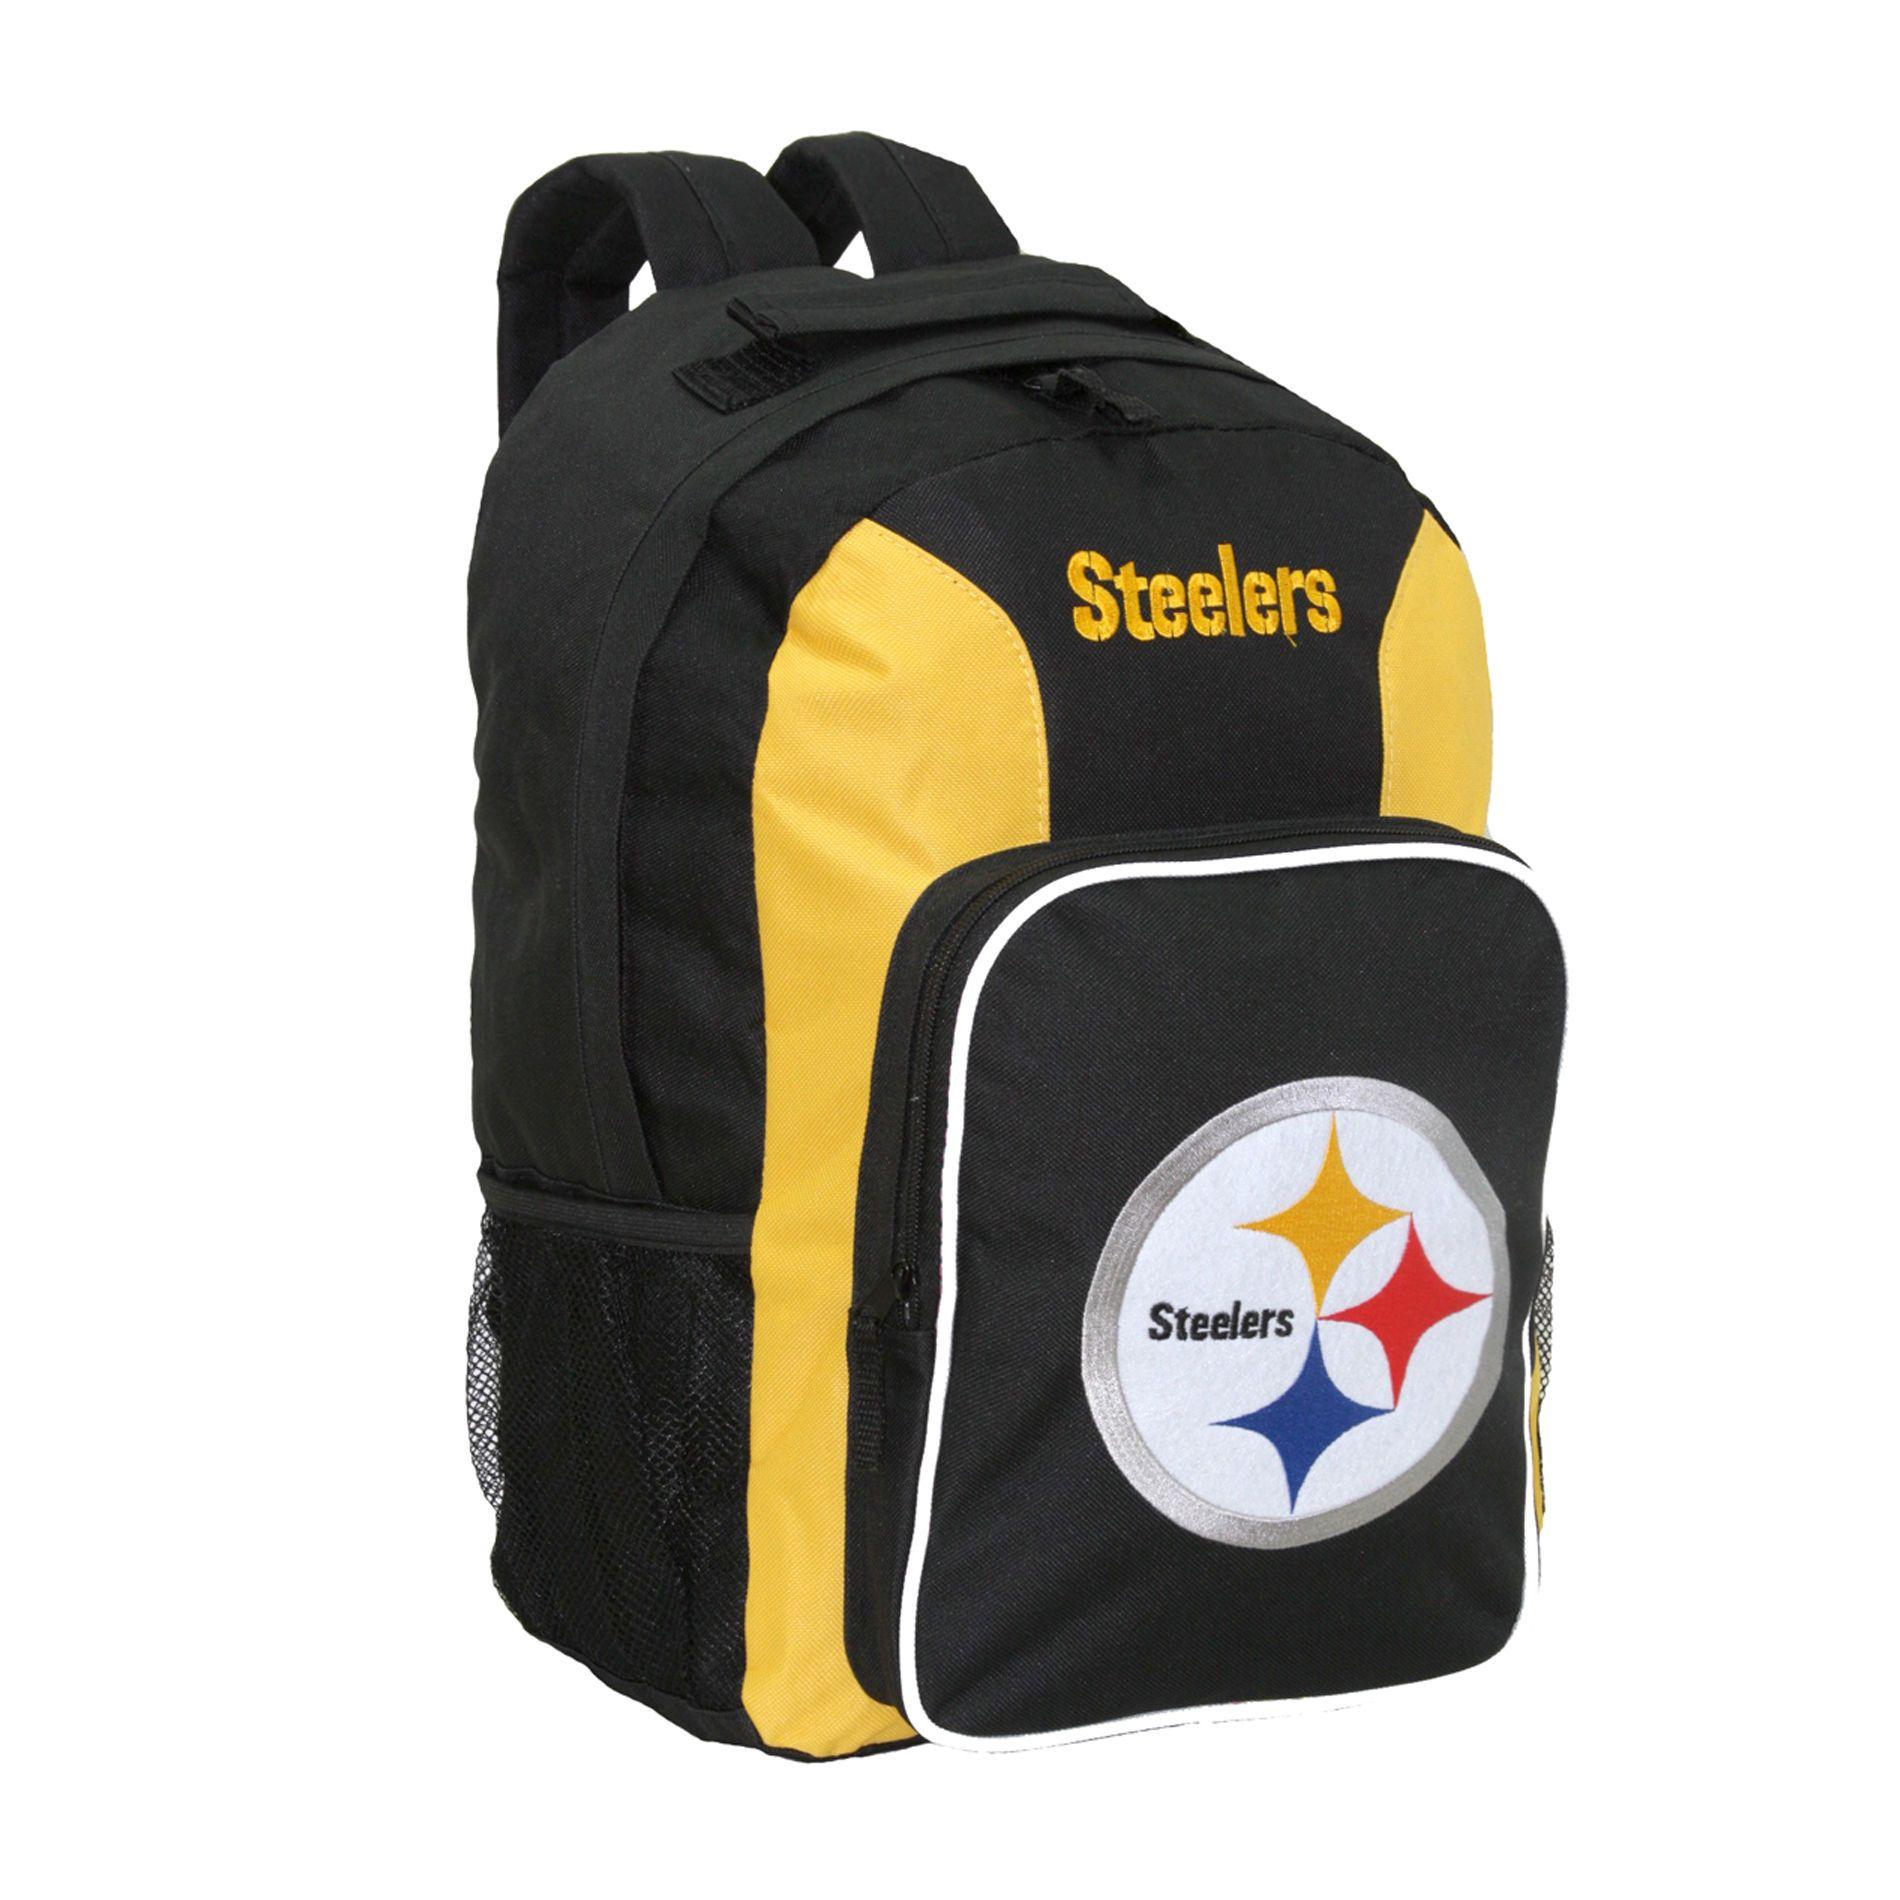 concept refurbished nfl pittsburgh steelers team logo backpack - Pittsburgh Steelers Merchandise